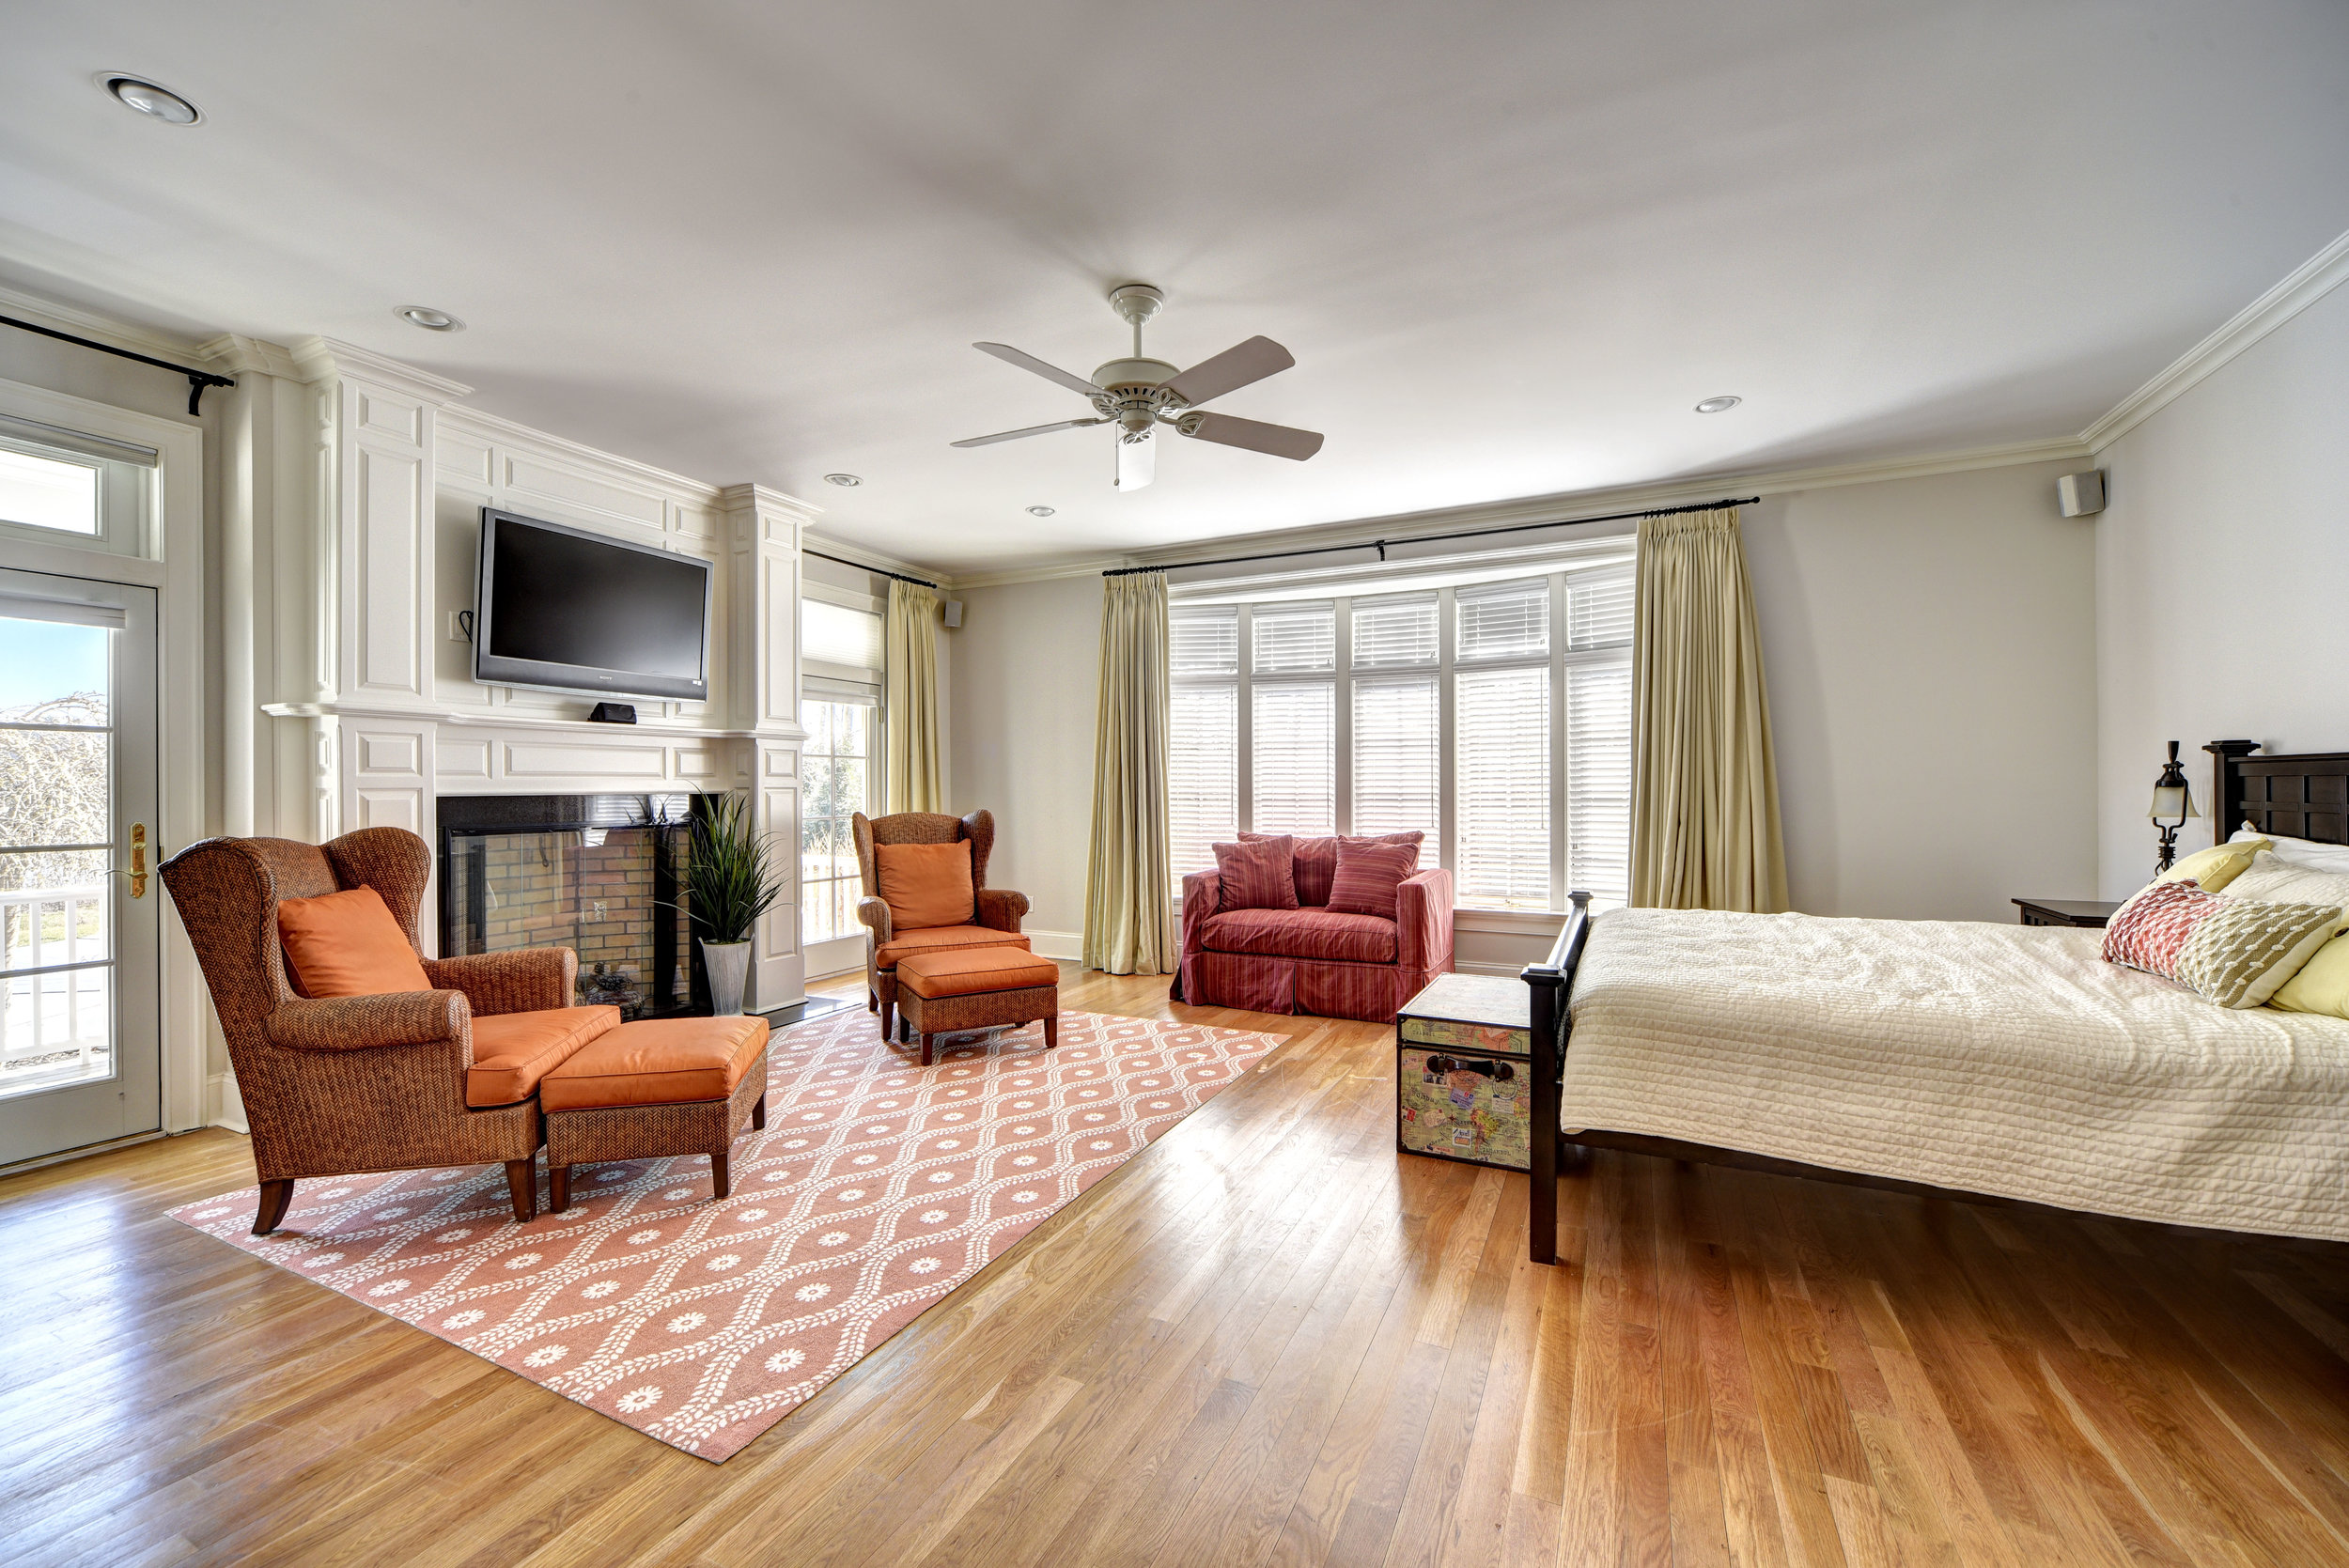 29 Winthrop Rd bed2.jpg